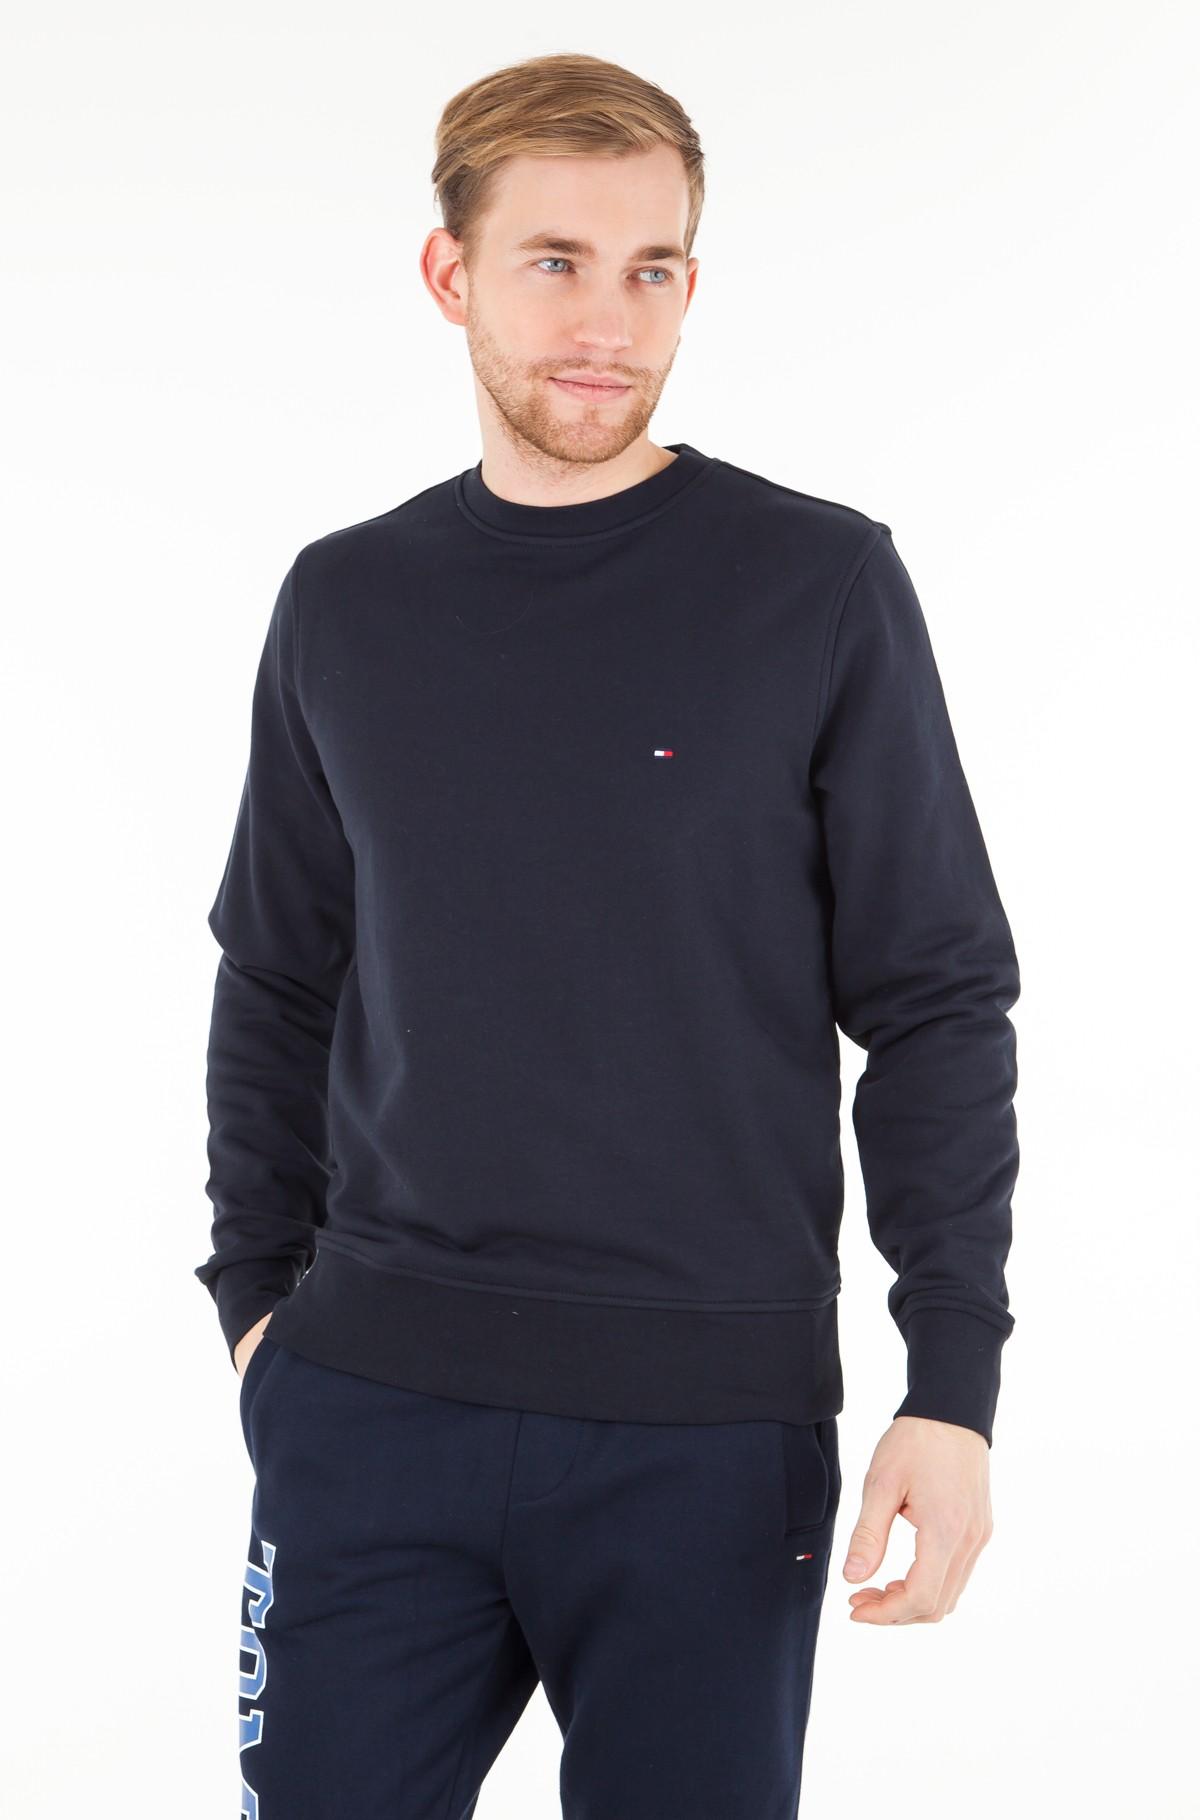 Sporta džemperis CORE COTTON SWEATSHIRT-full-1